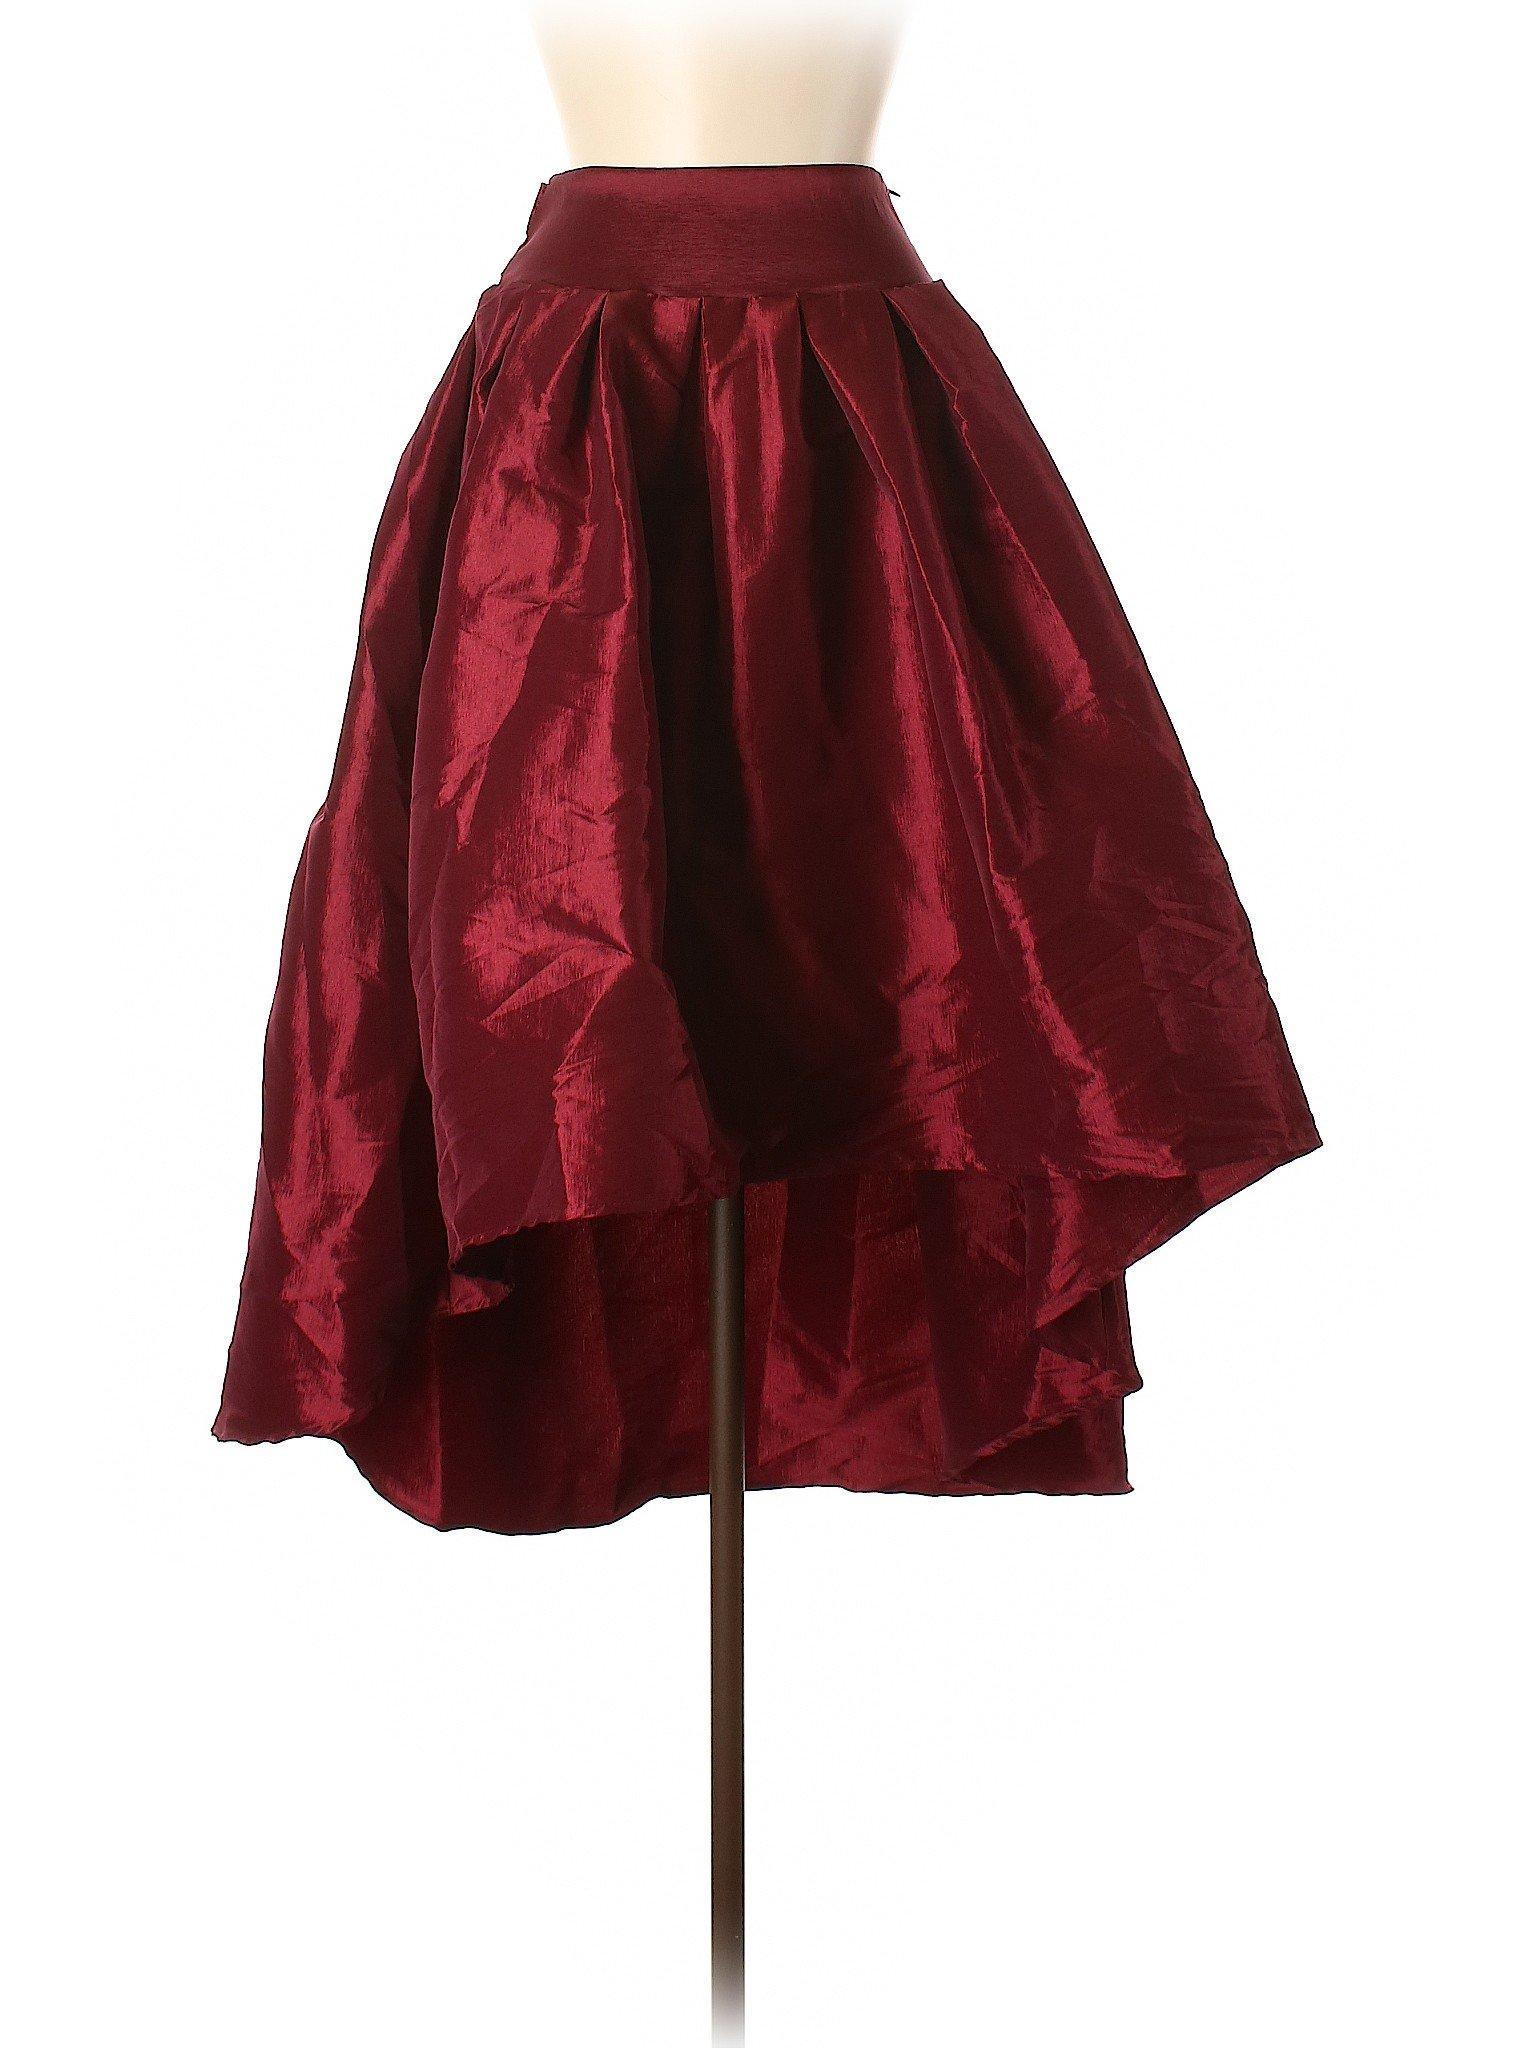 Formal Skirt Haute winter Leisure Monde qw8Y4txxP